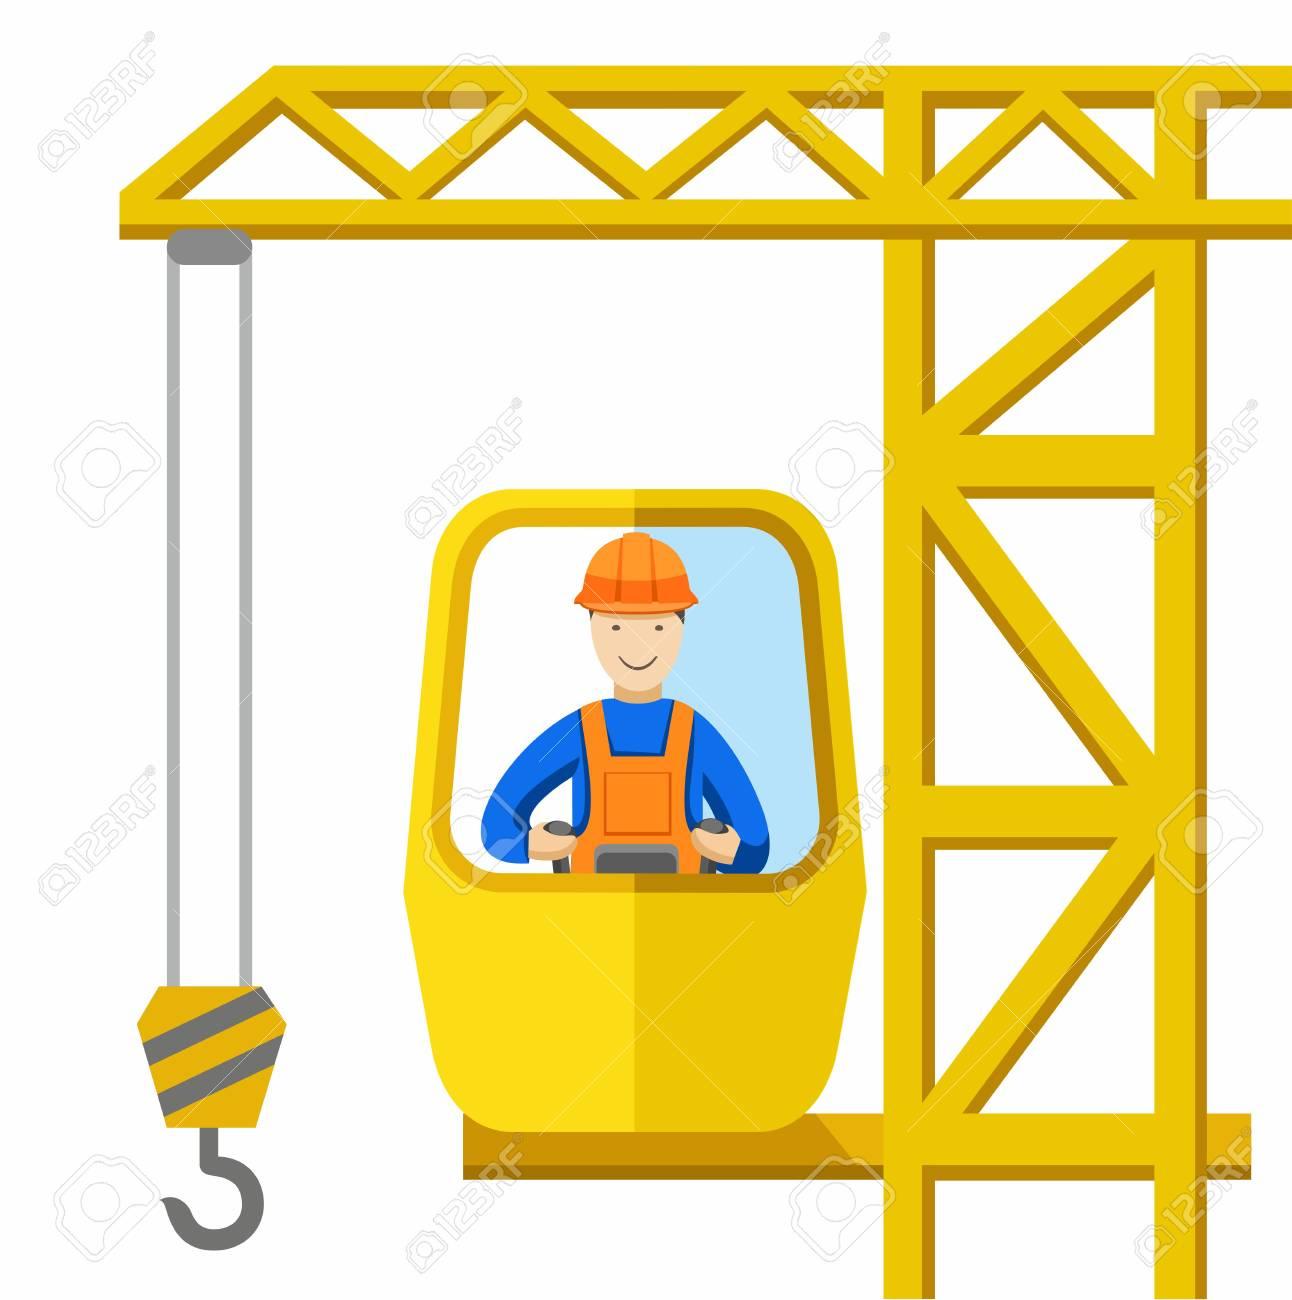 Mobile Crane Operator jobs in Pakistan